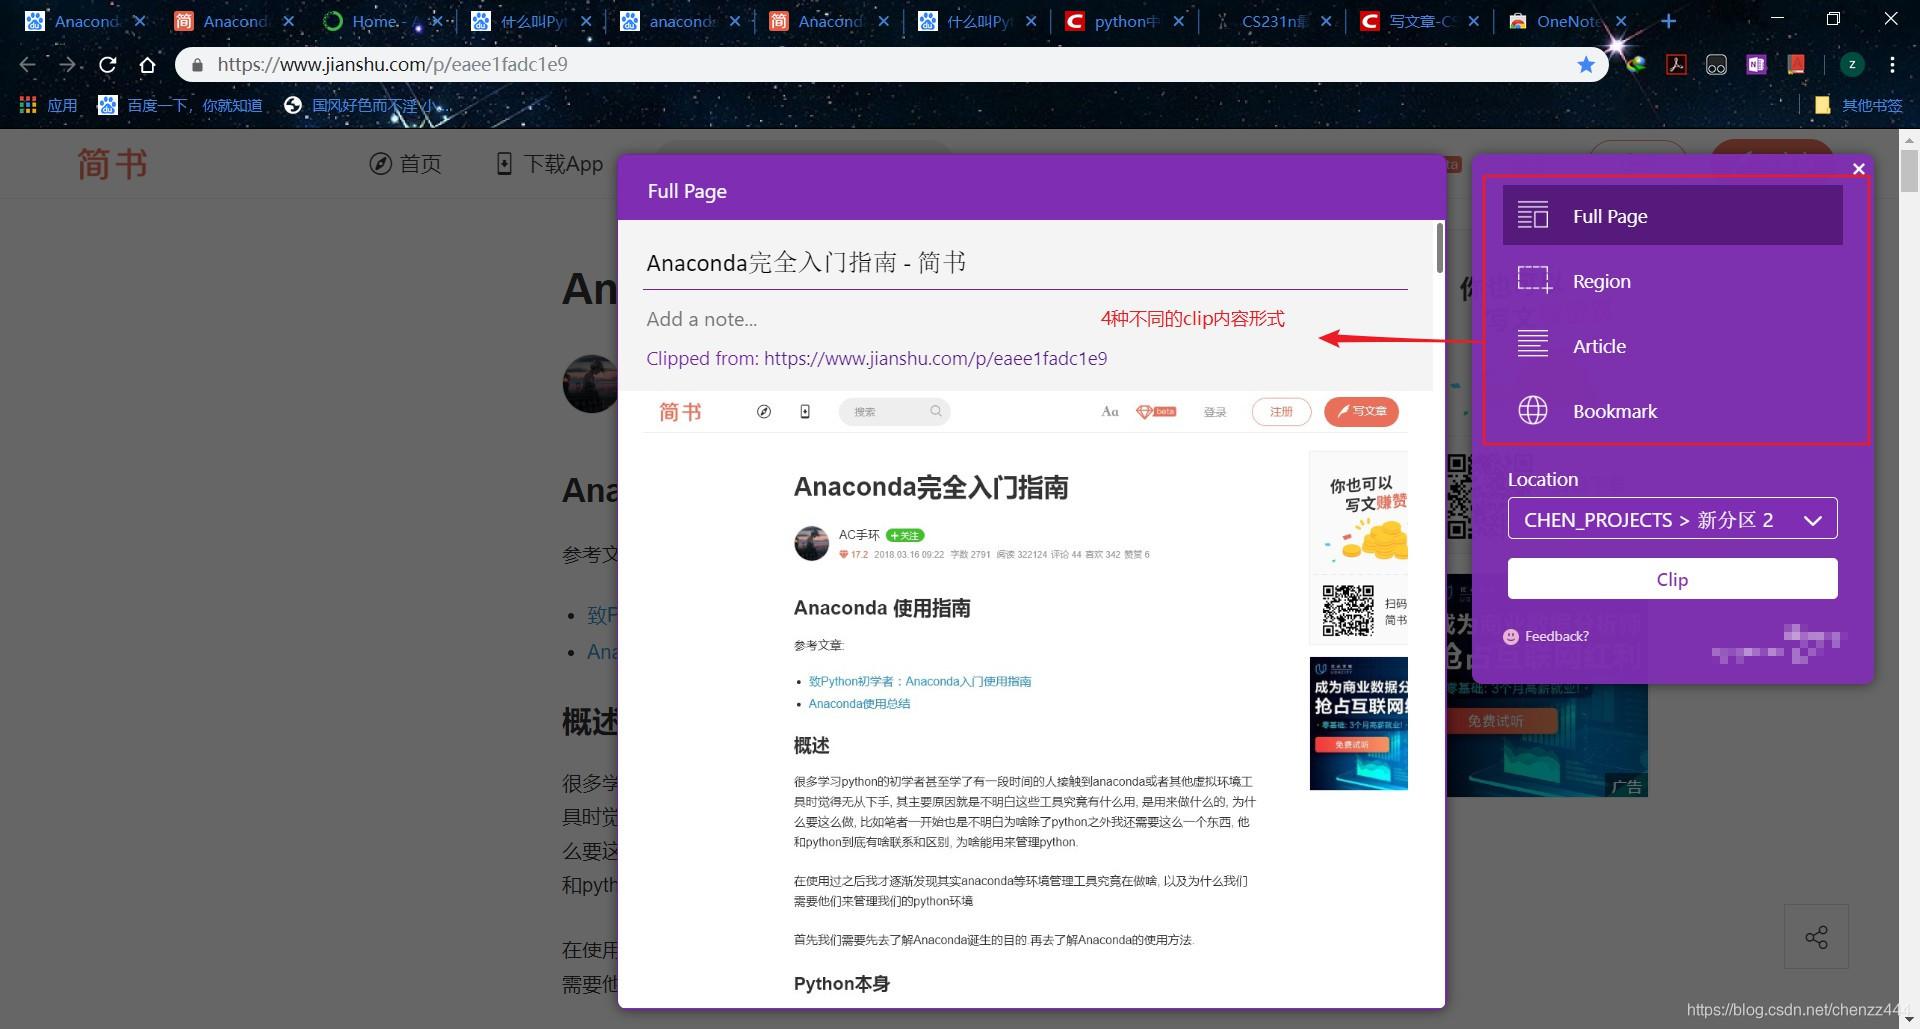 Chrome插件:OneNote Web Clipper 搜集和整合碎片信息的神器